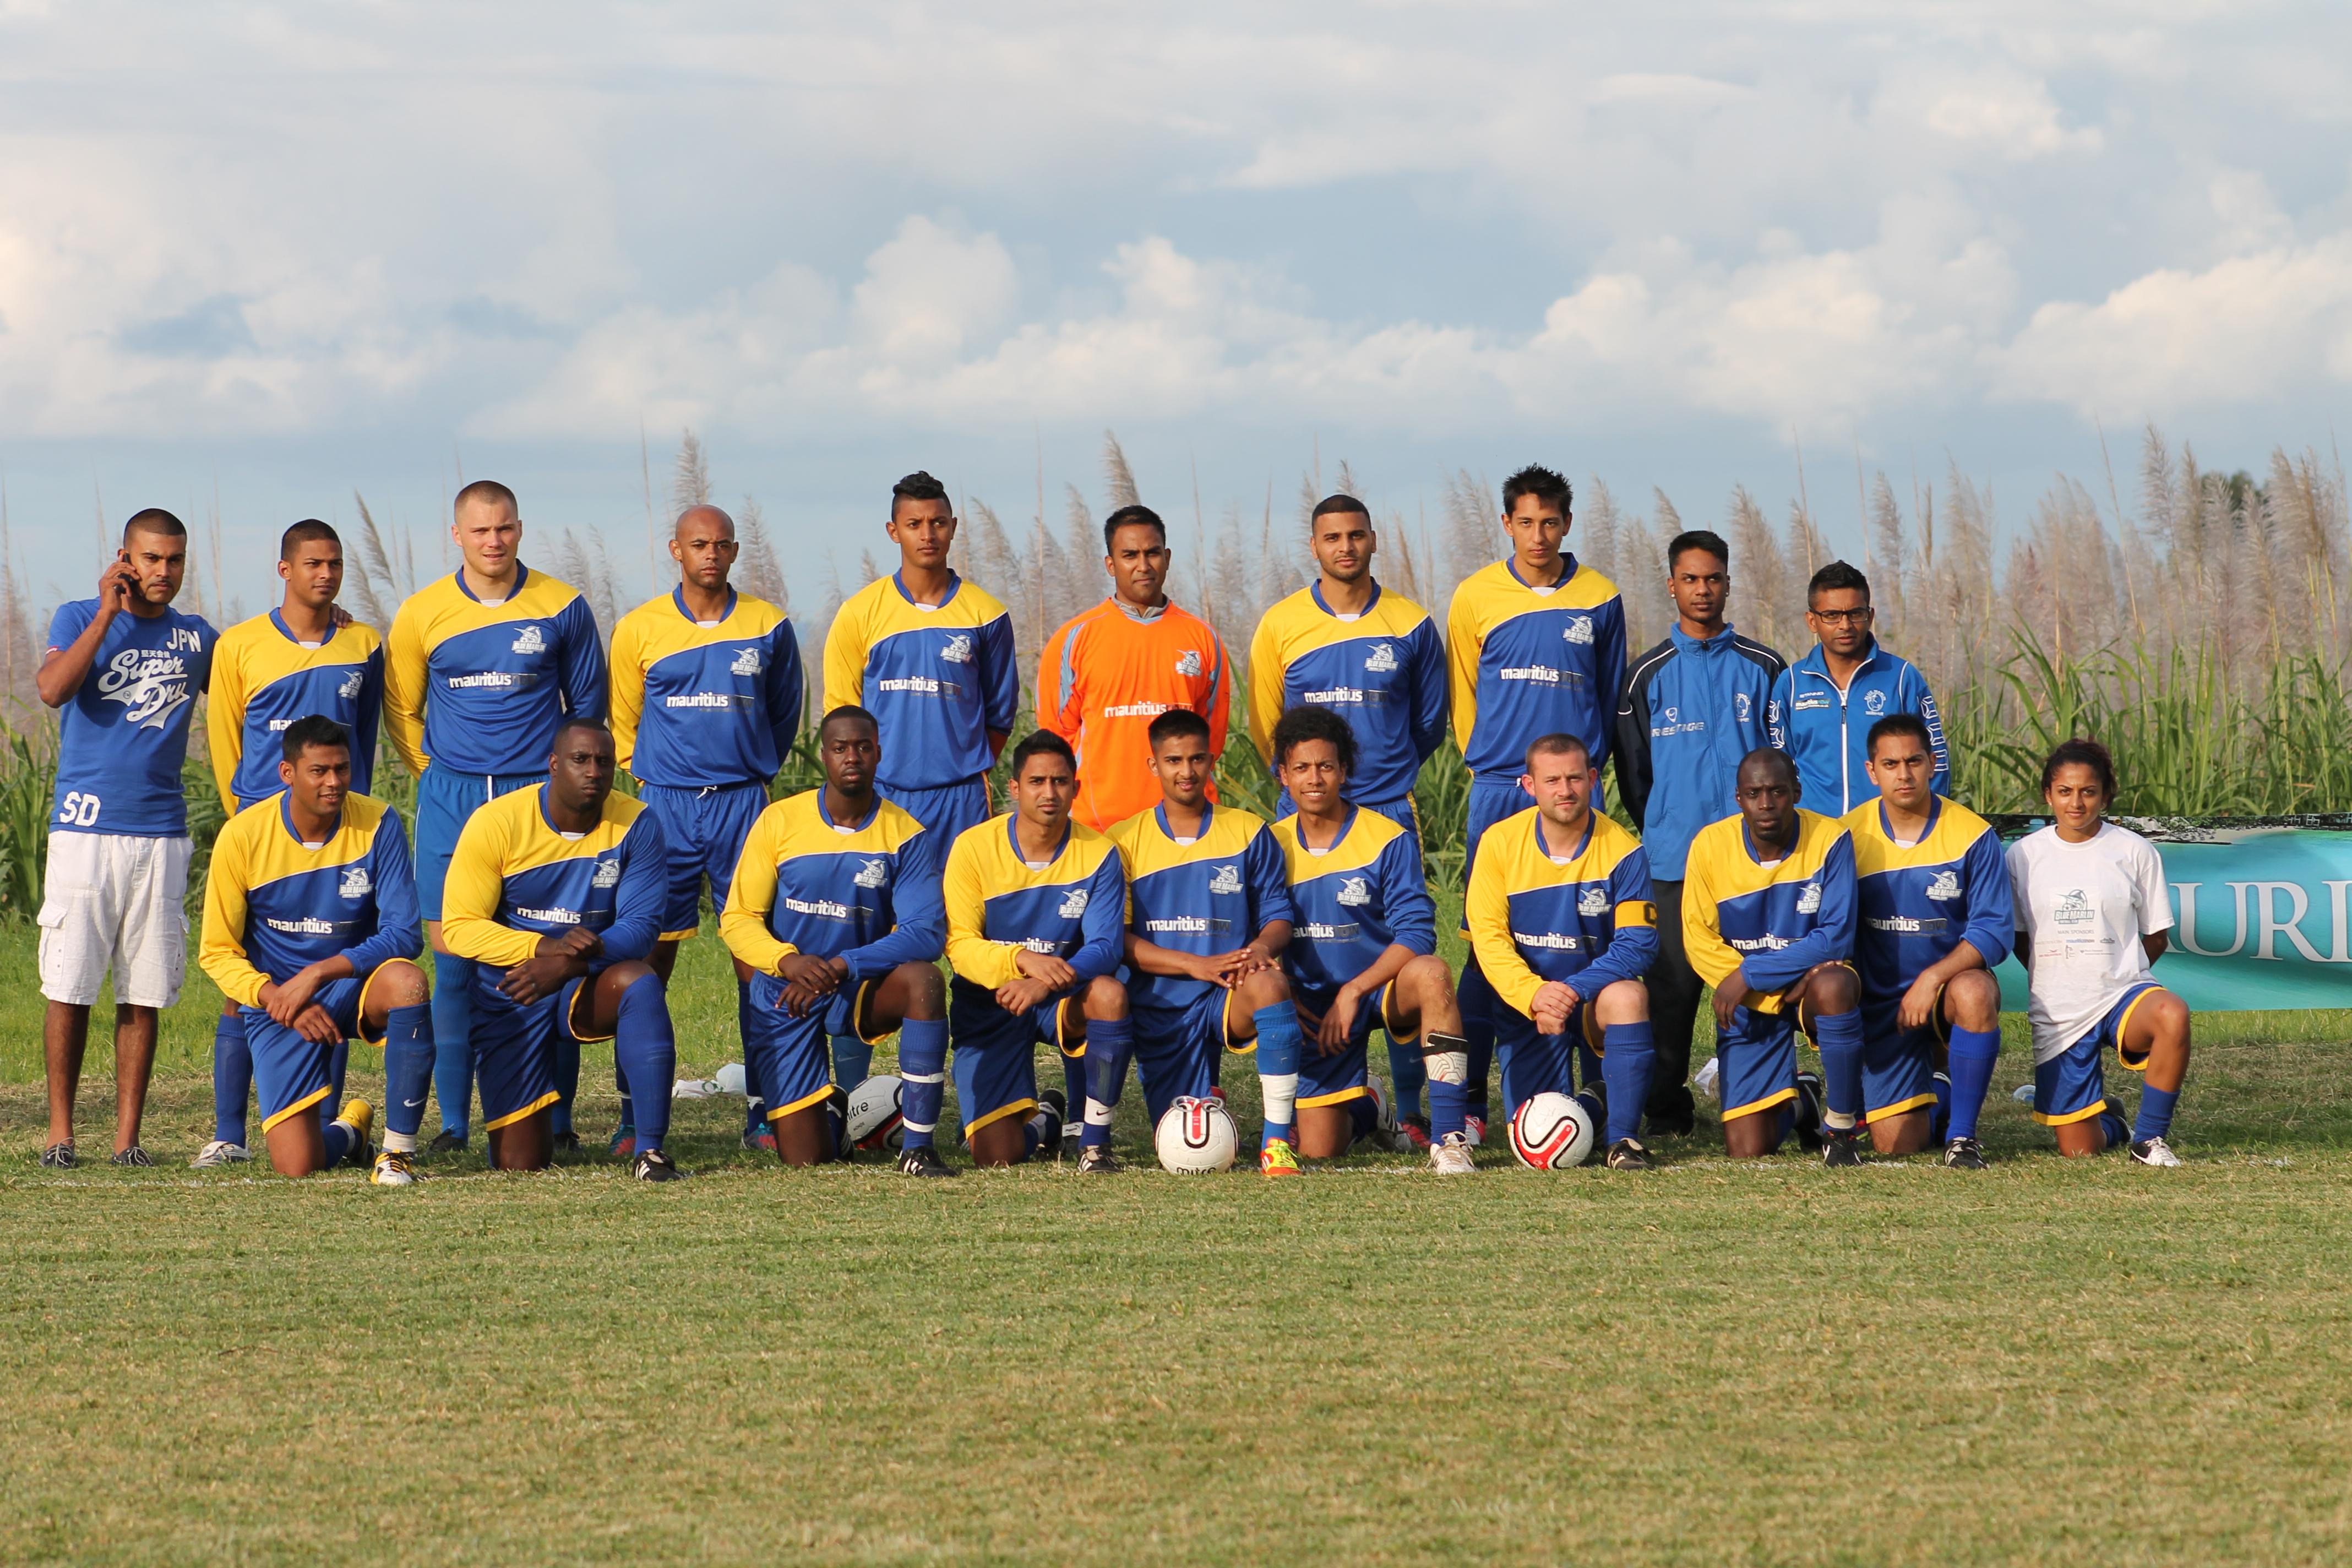 2012 Mauritius Tour